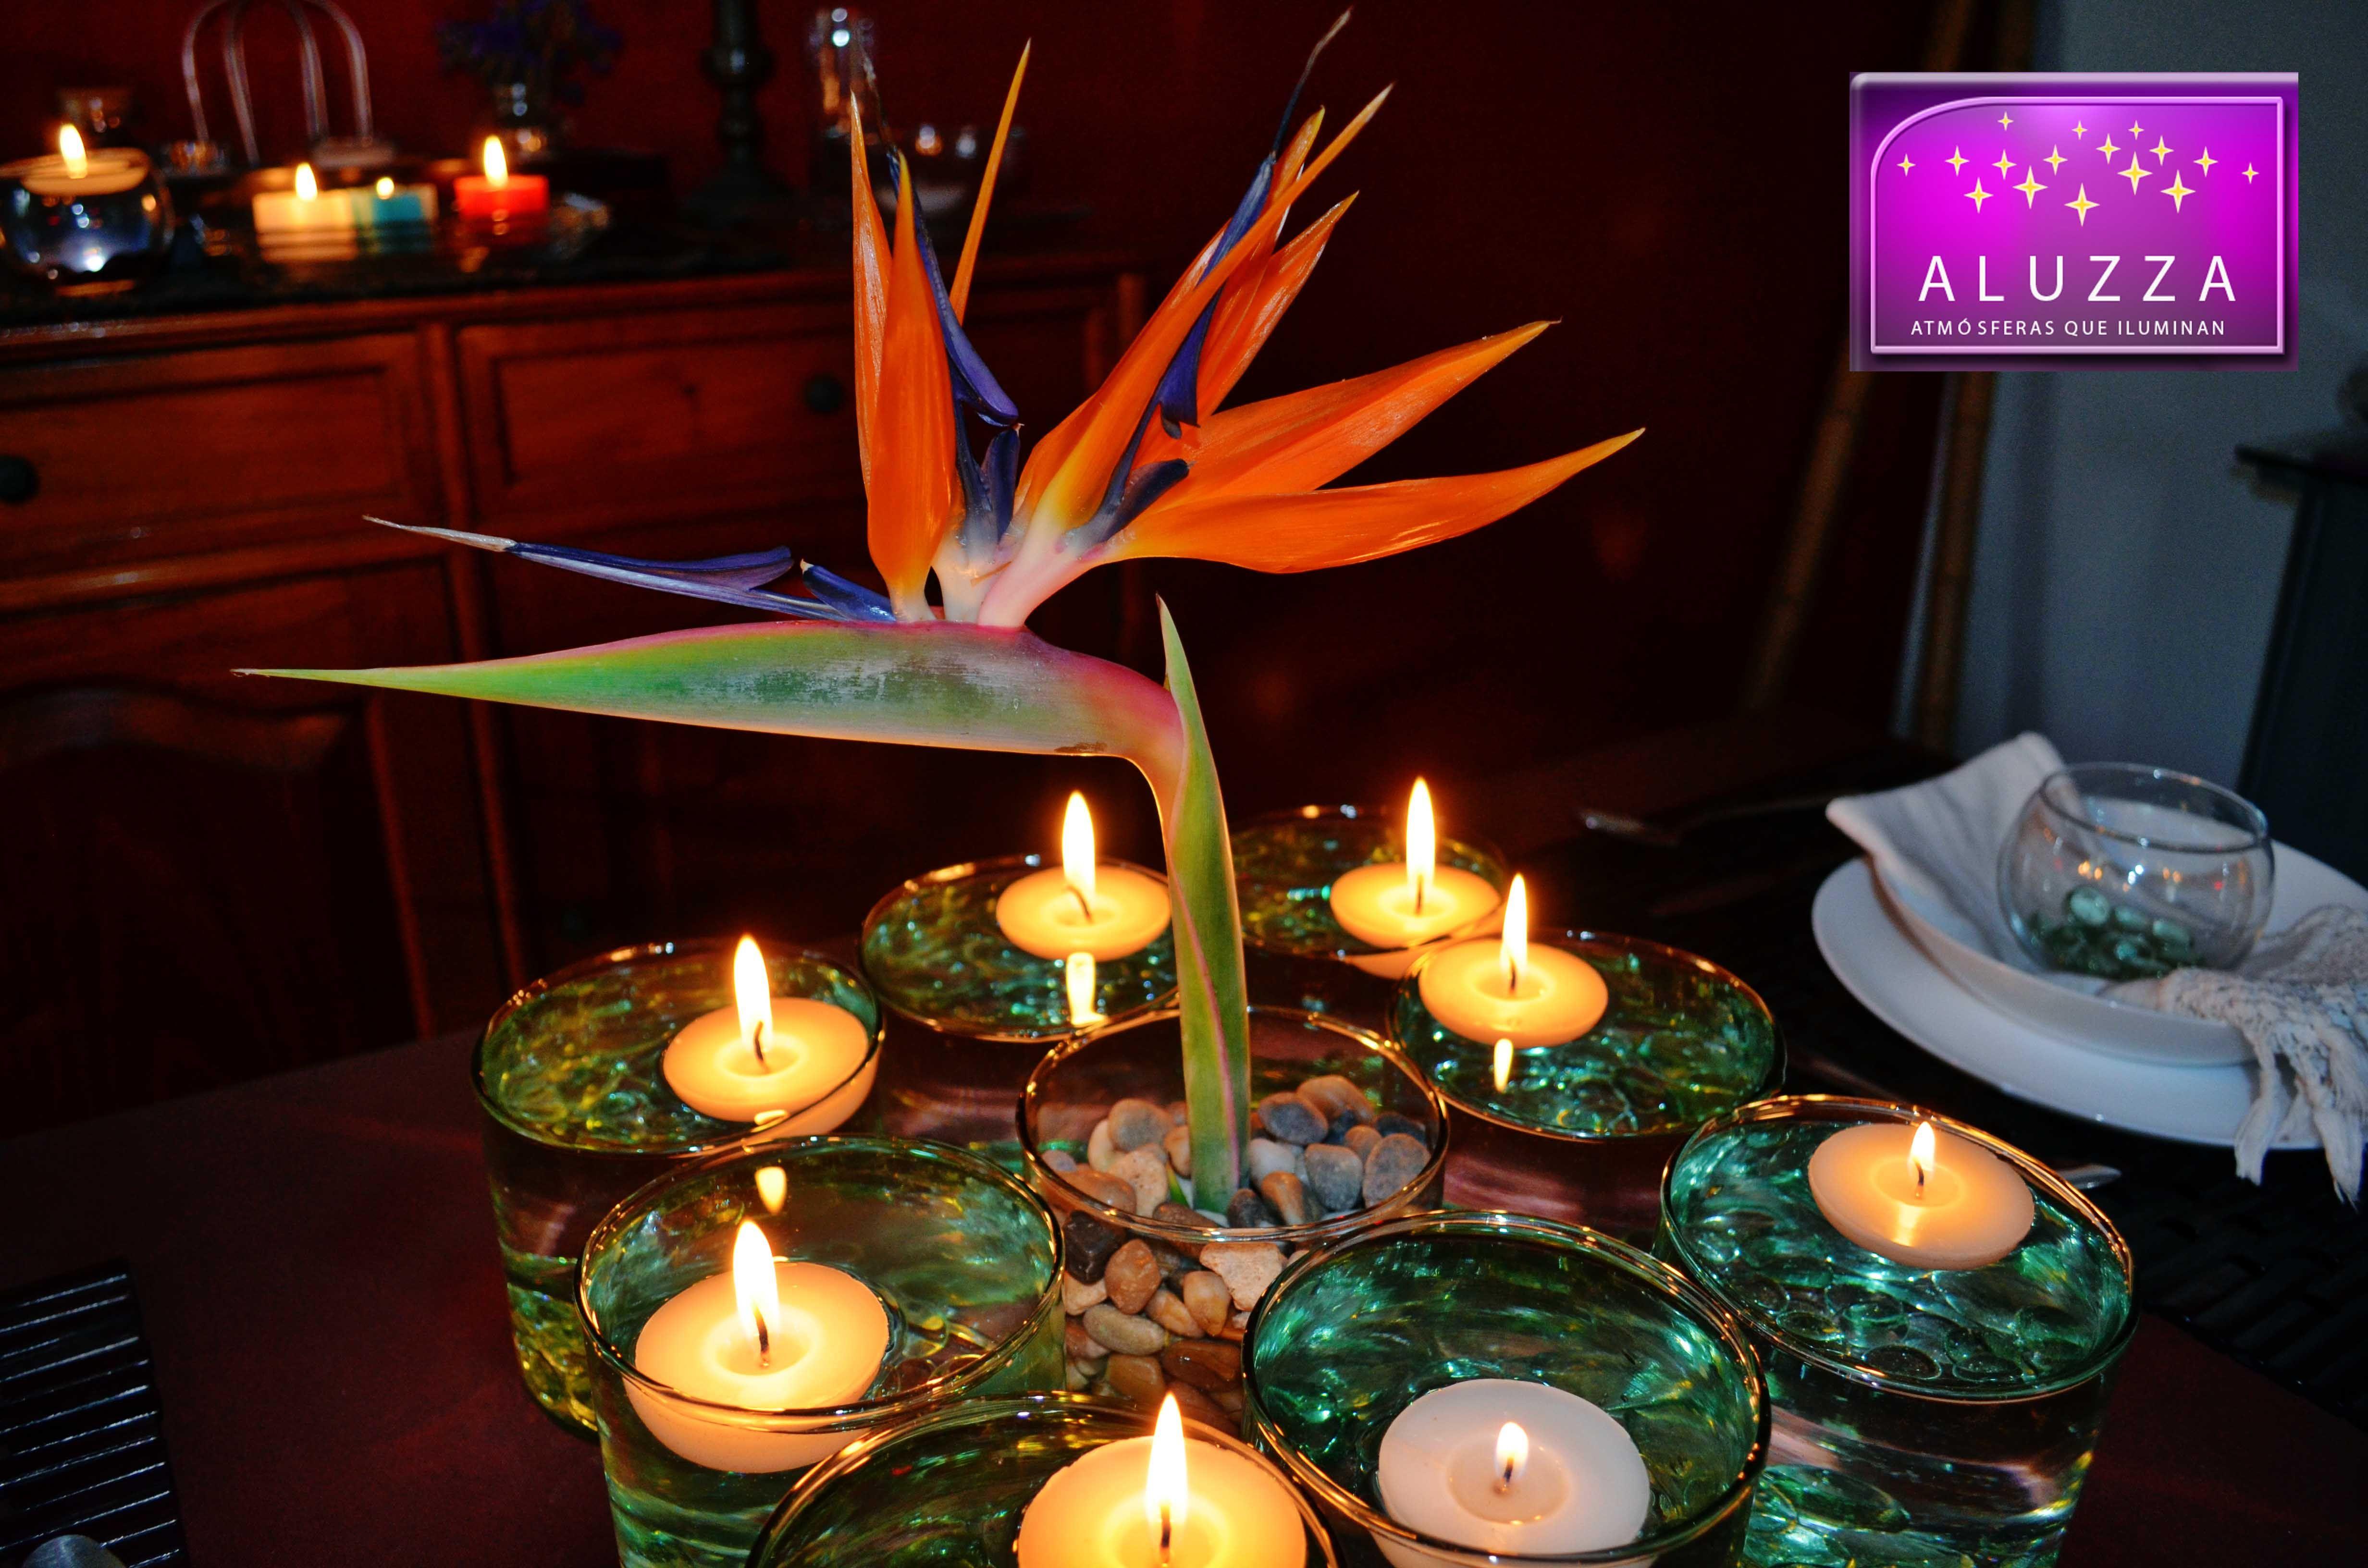 Centro de mesa con gemas y velas flotantes aluzza - Centros de mesa con velas ...